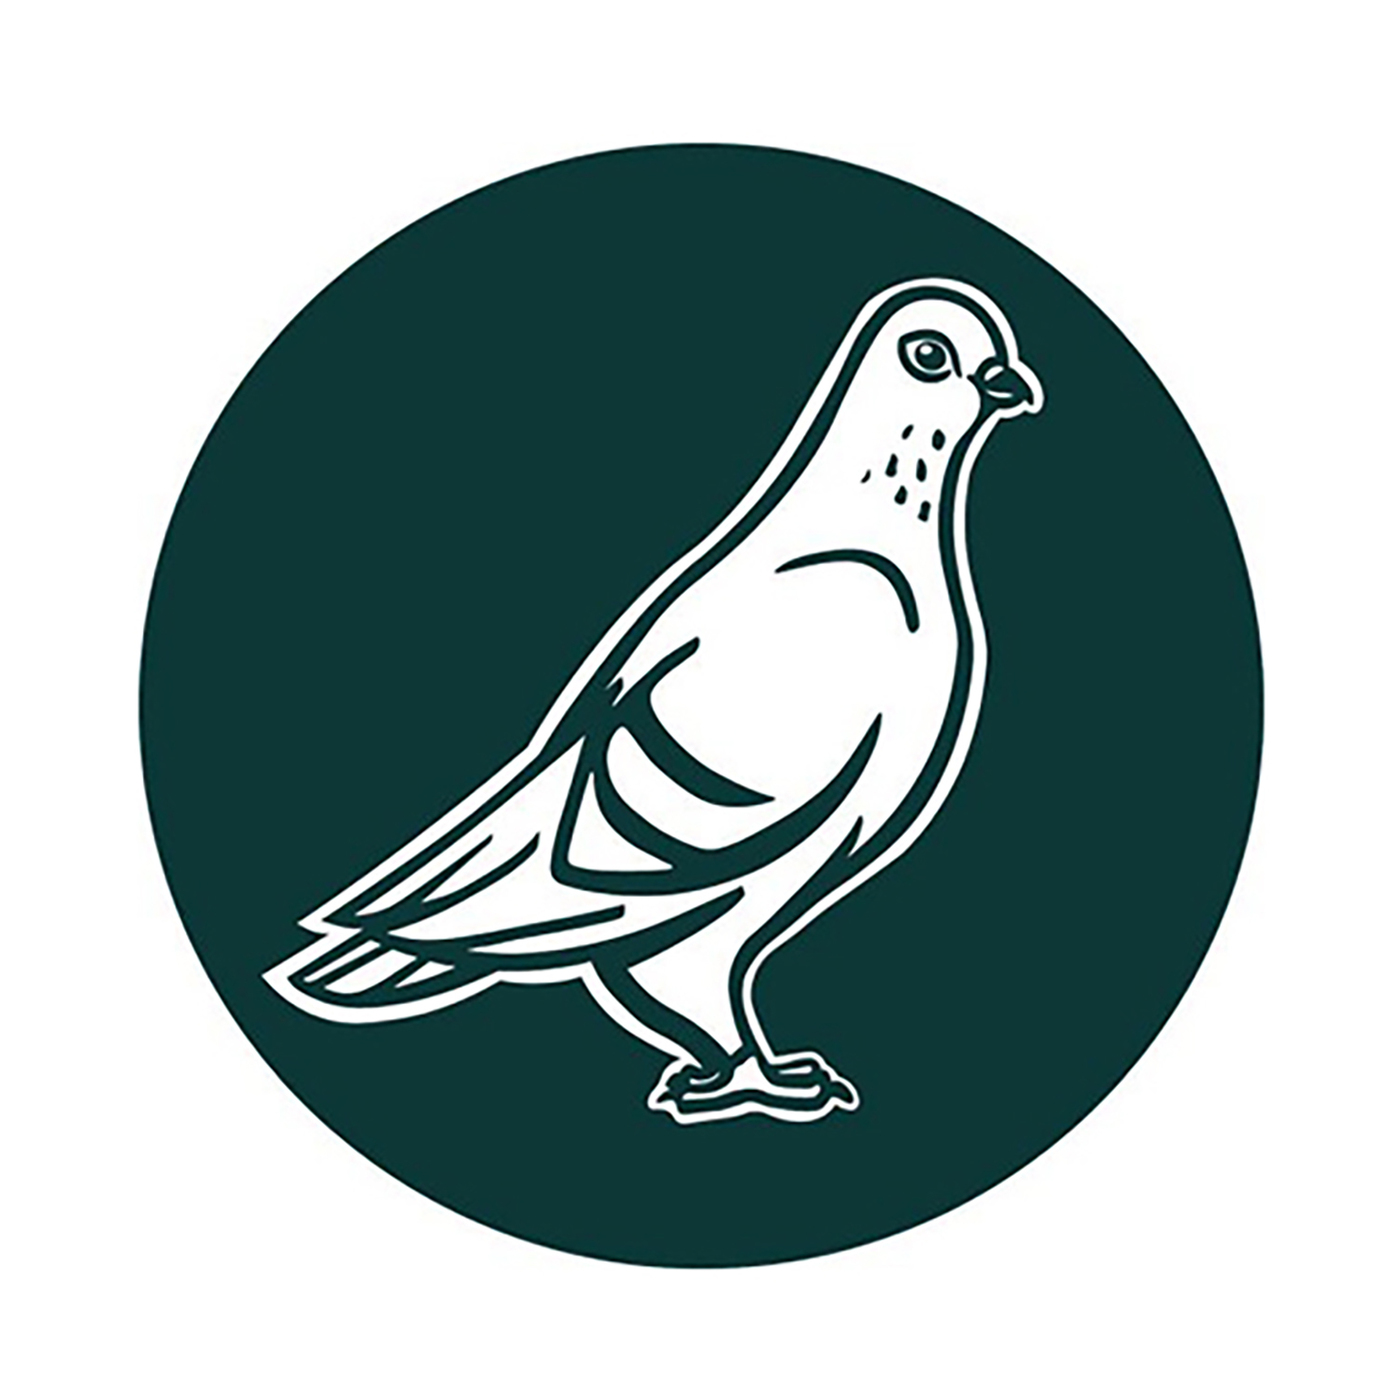 The Pigeon's Tegwyn Hughes and Bayleigh Marelj